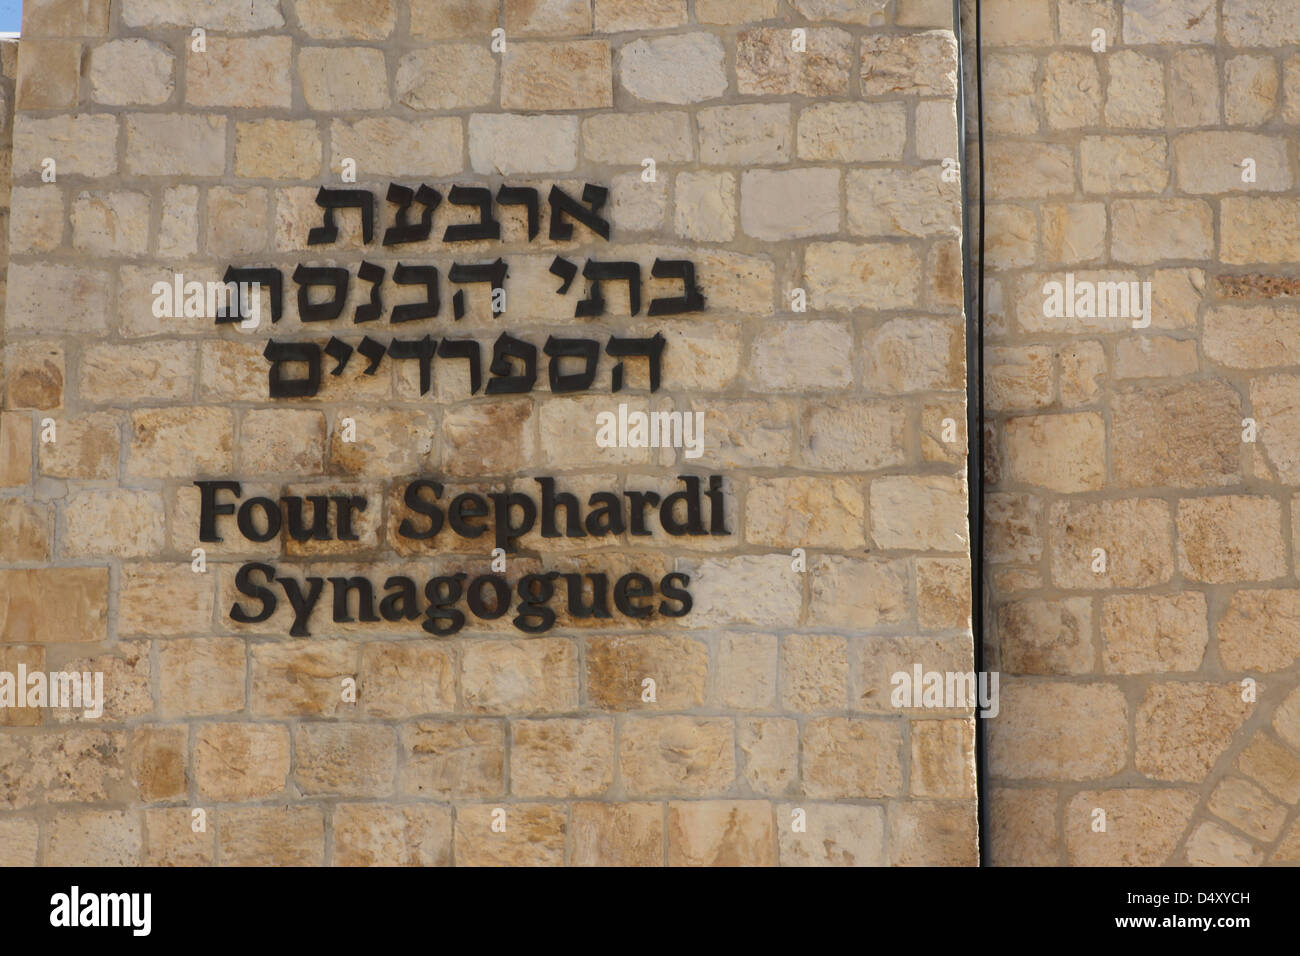 Israel, Jerusalem, Old City, Jewish Quarter, the Four Sephardic Synagogues complex - Stock Image